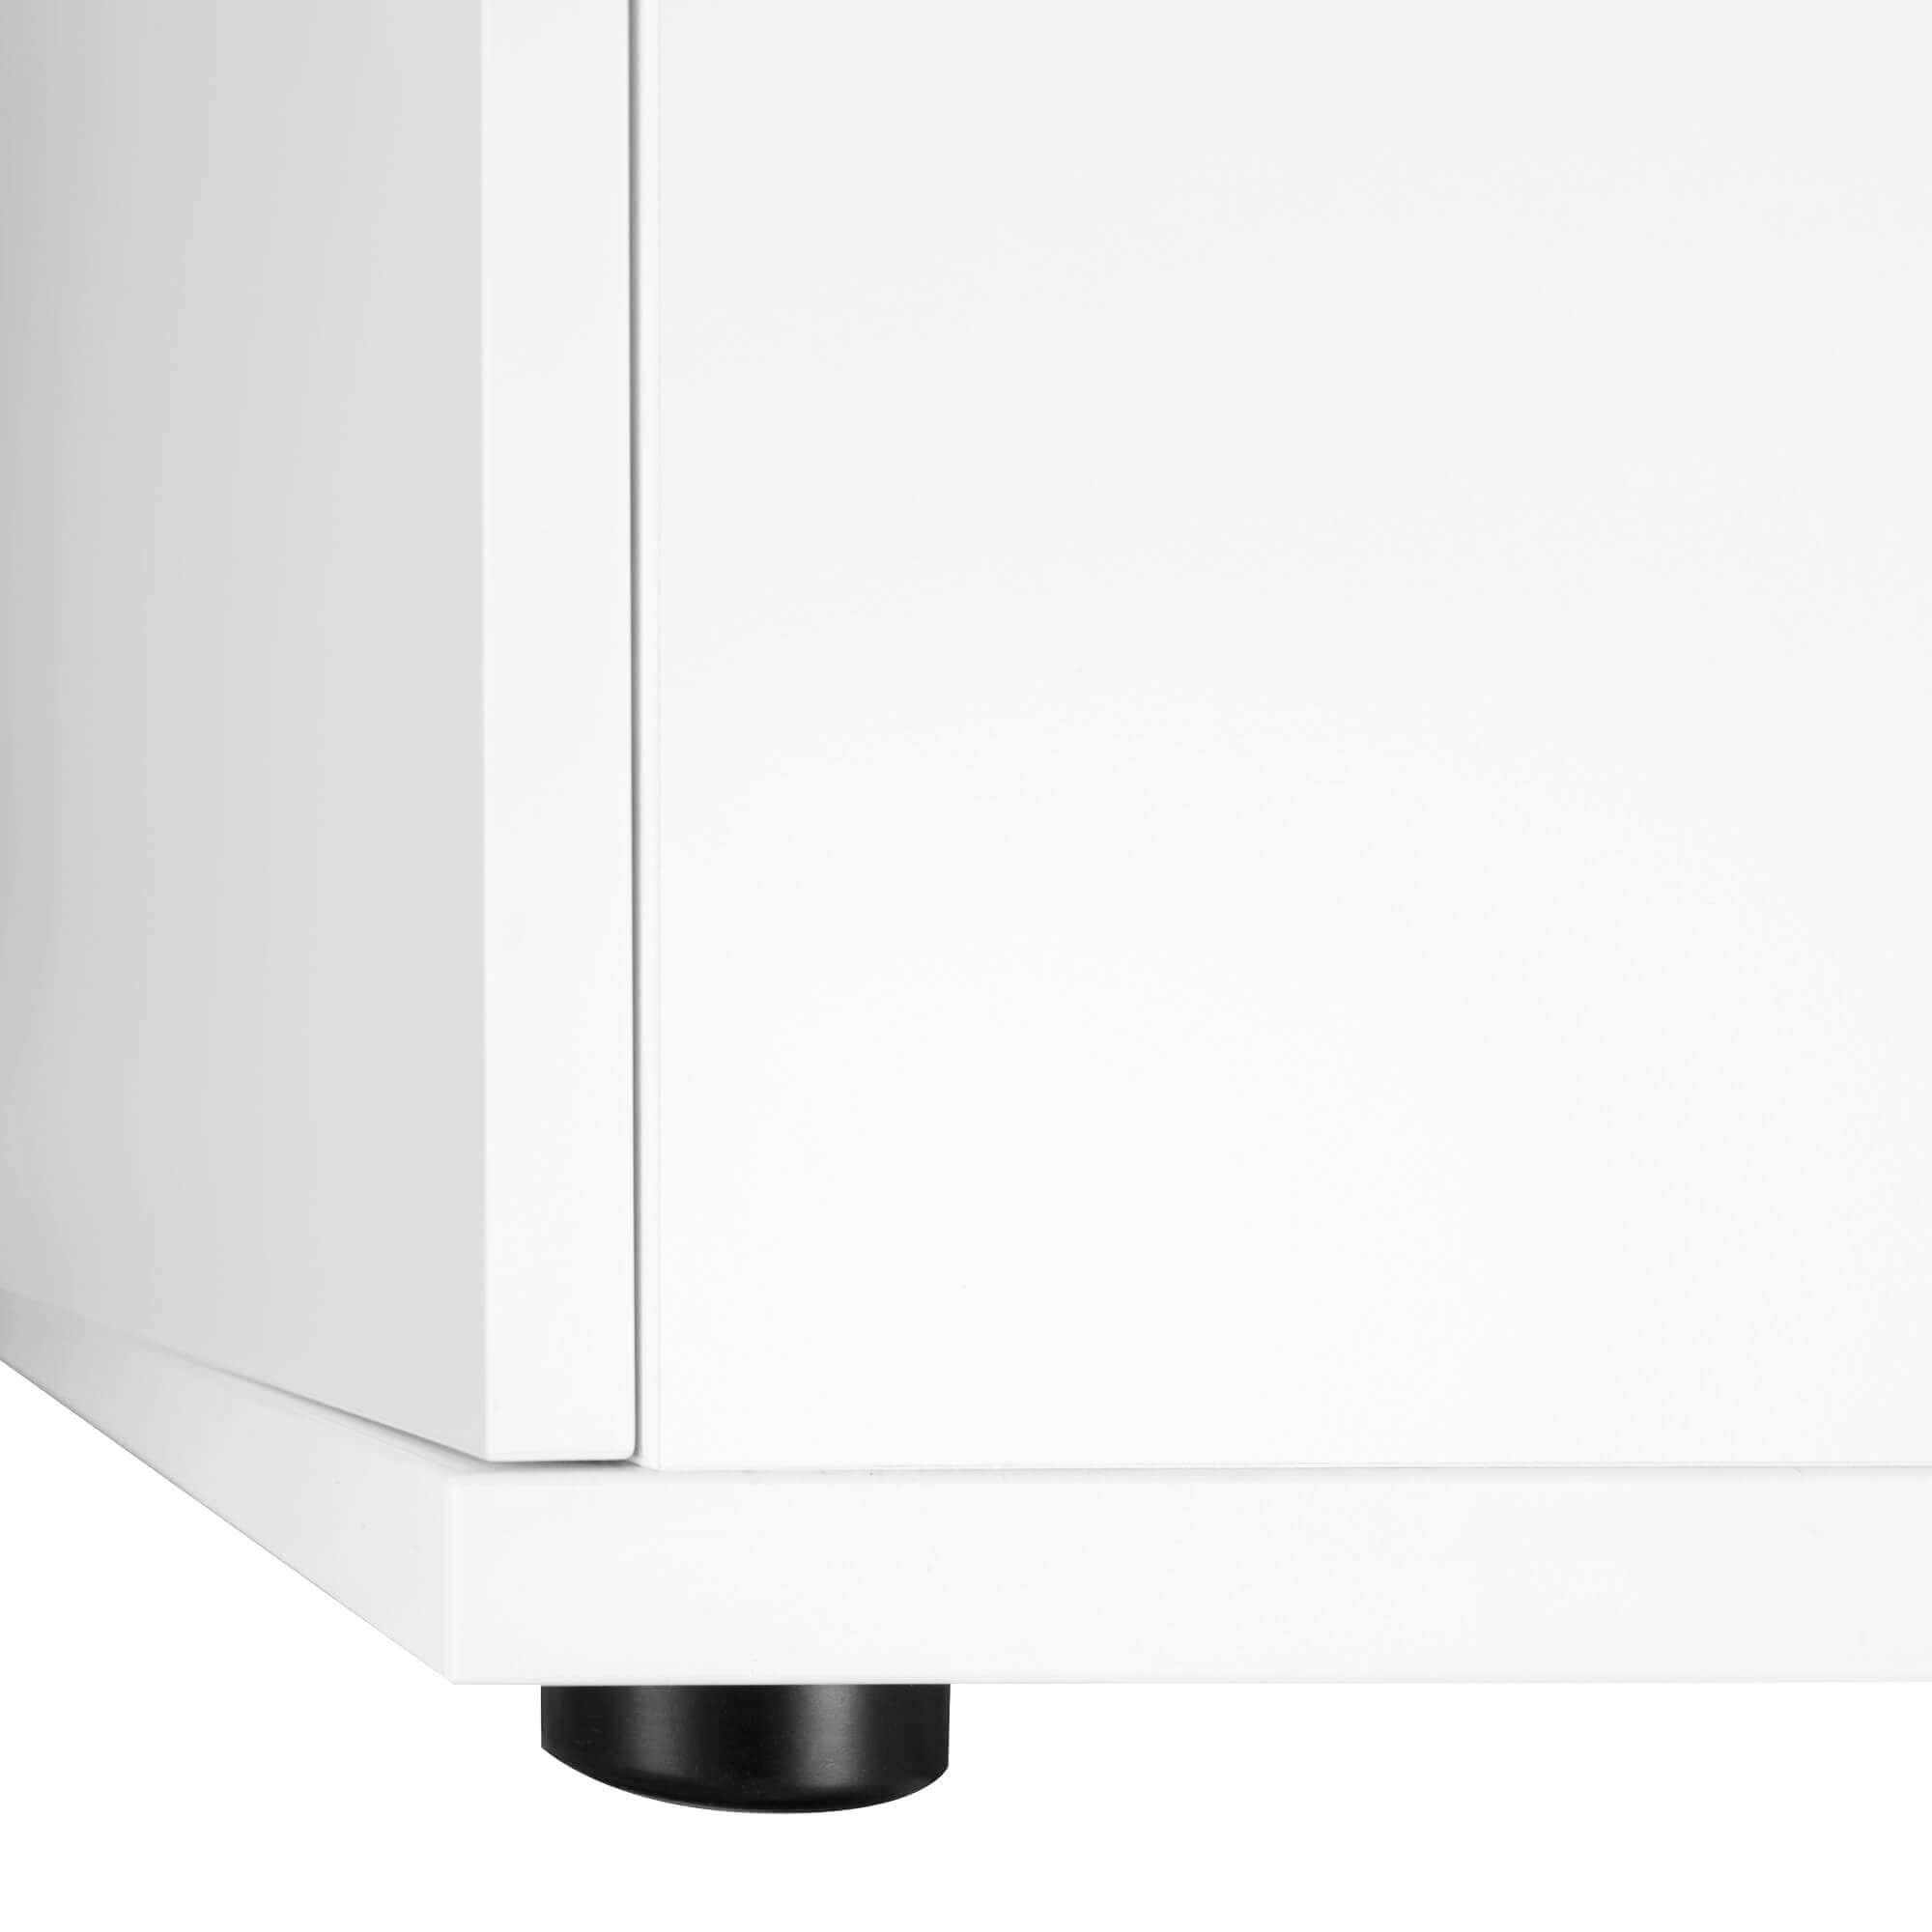 PROFI Aktenschrank abschließbar 2OH Weiß Schrank Büroschrank Flügeltürenschrank